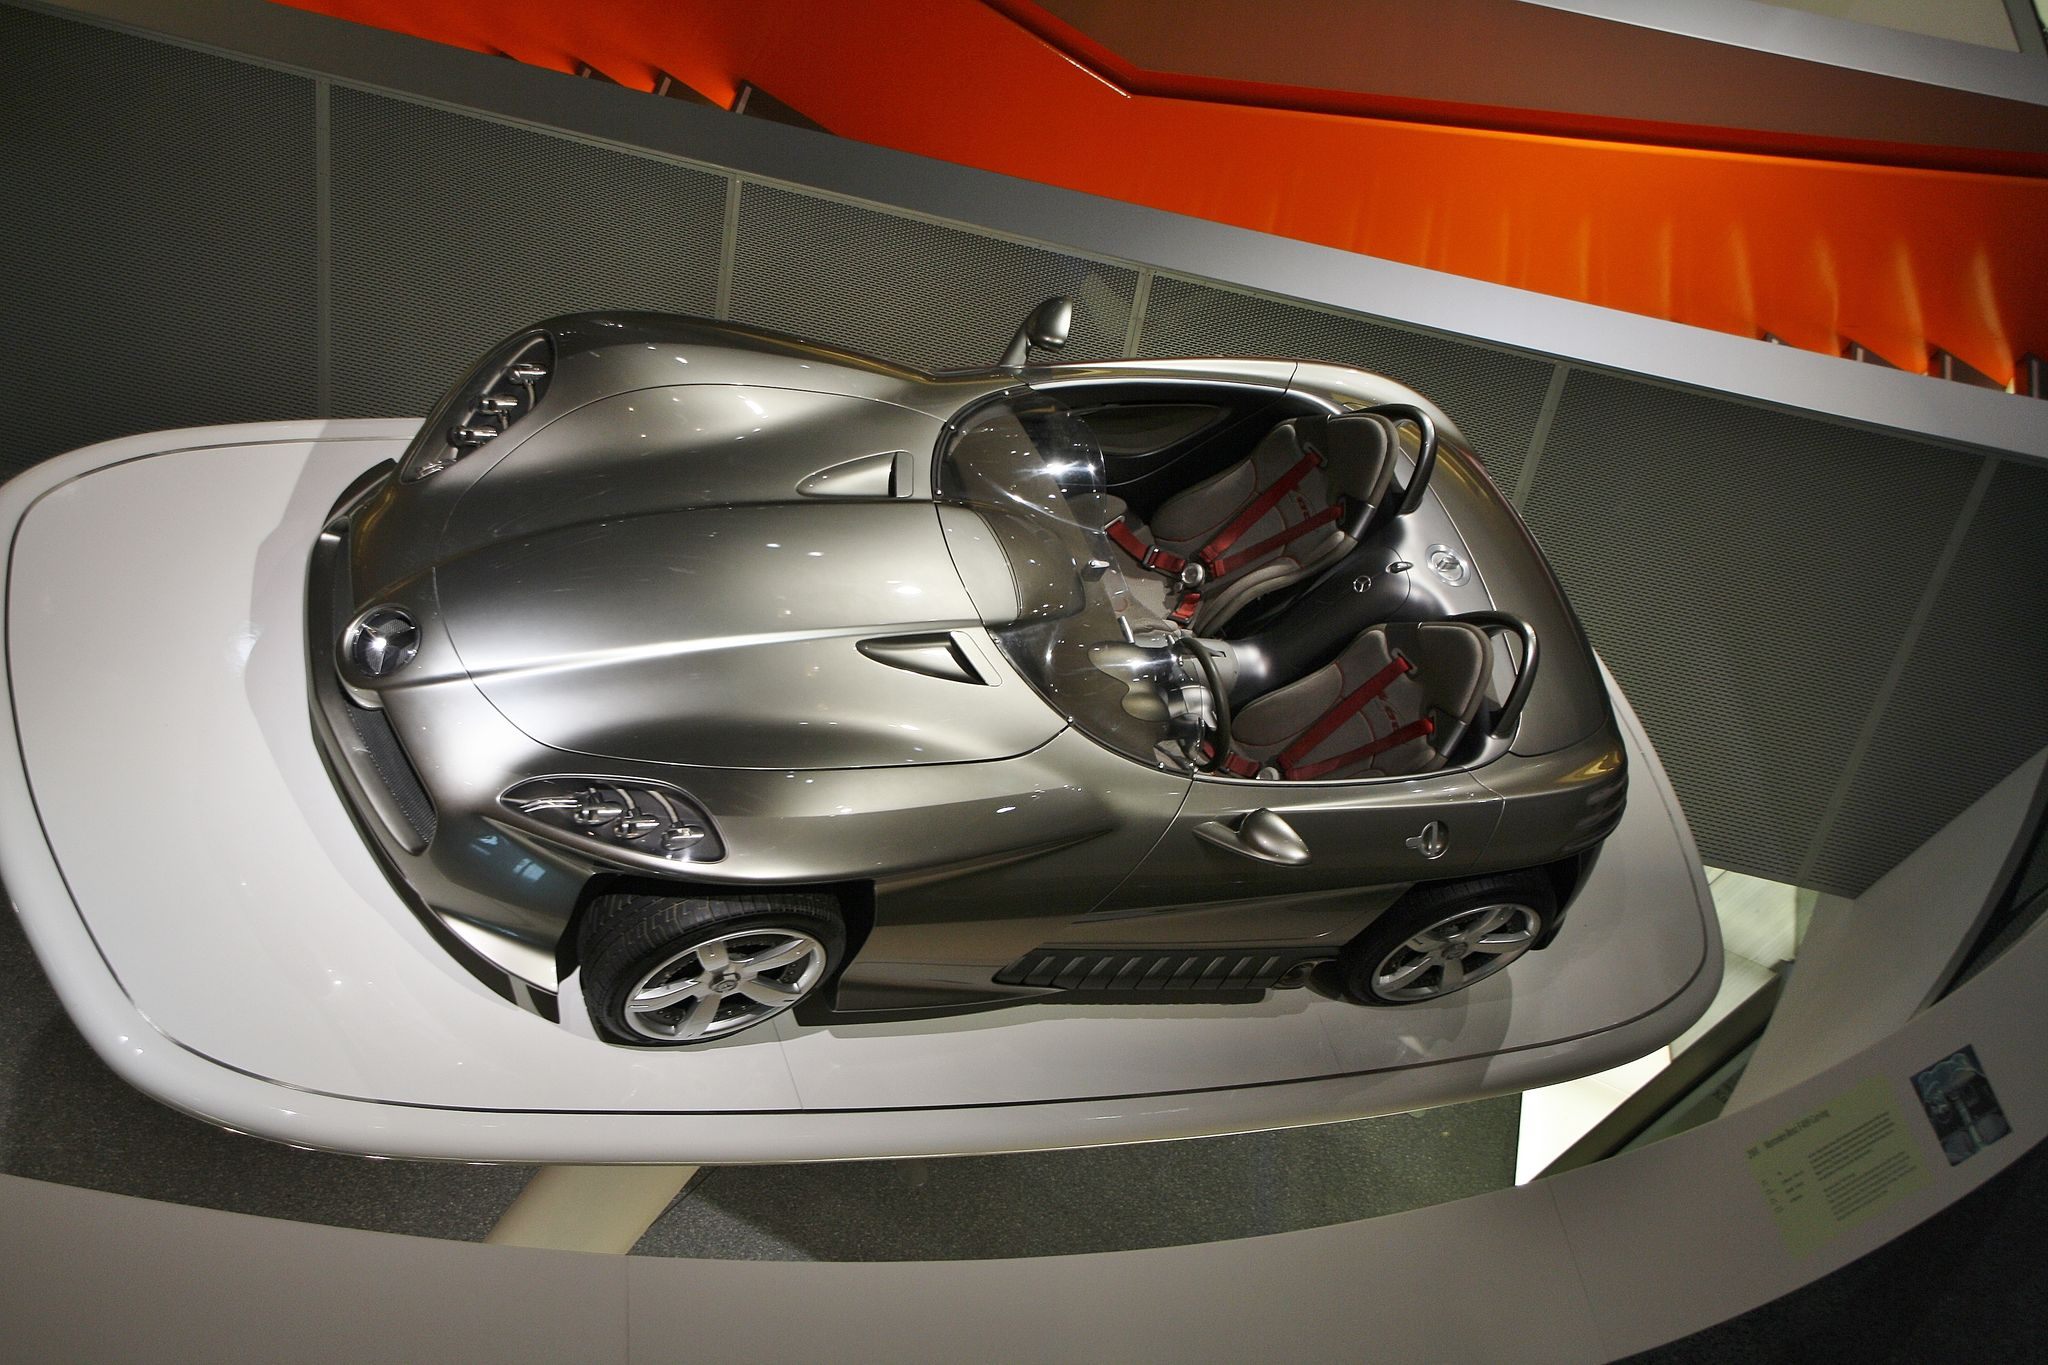 mercedes benz museum8 Mercedes Benz Museum in Stuttgart, Germany